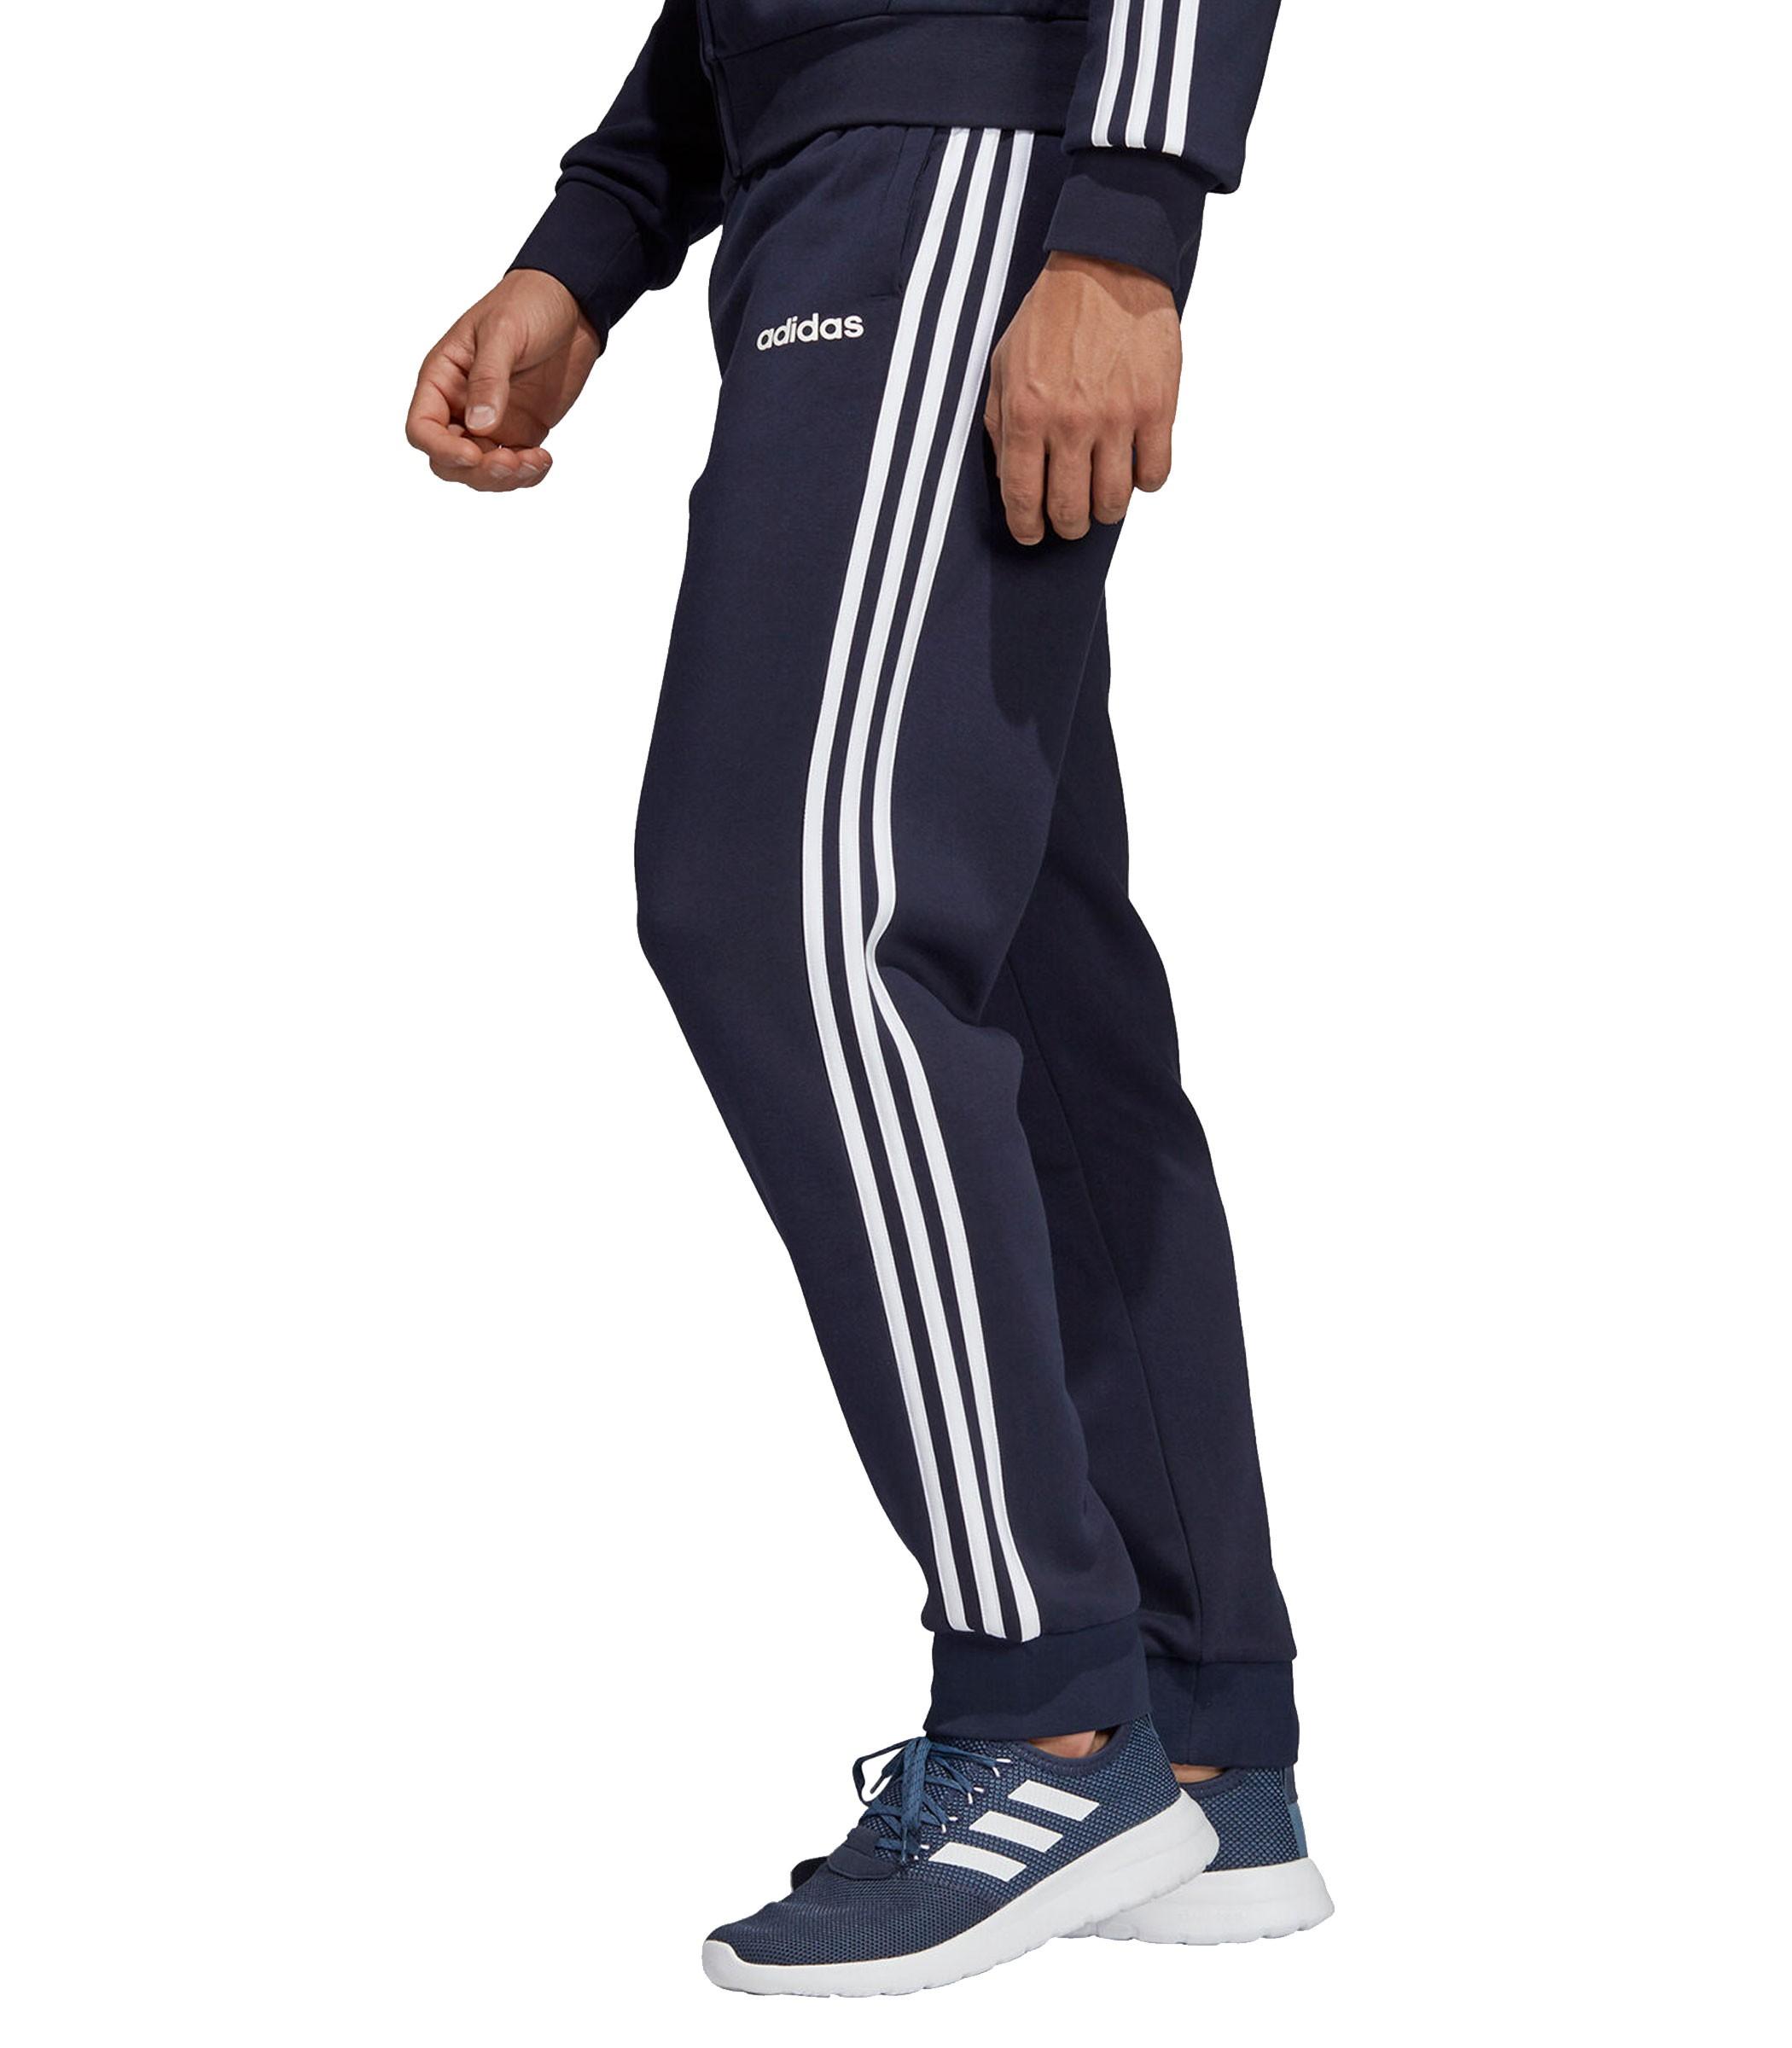 pantaloni tuta adidas 3 stripes